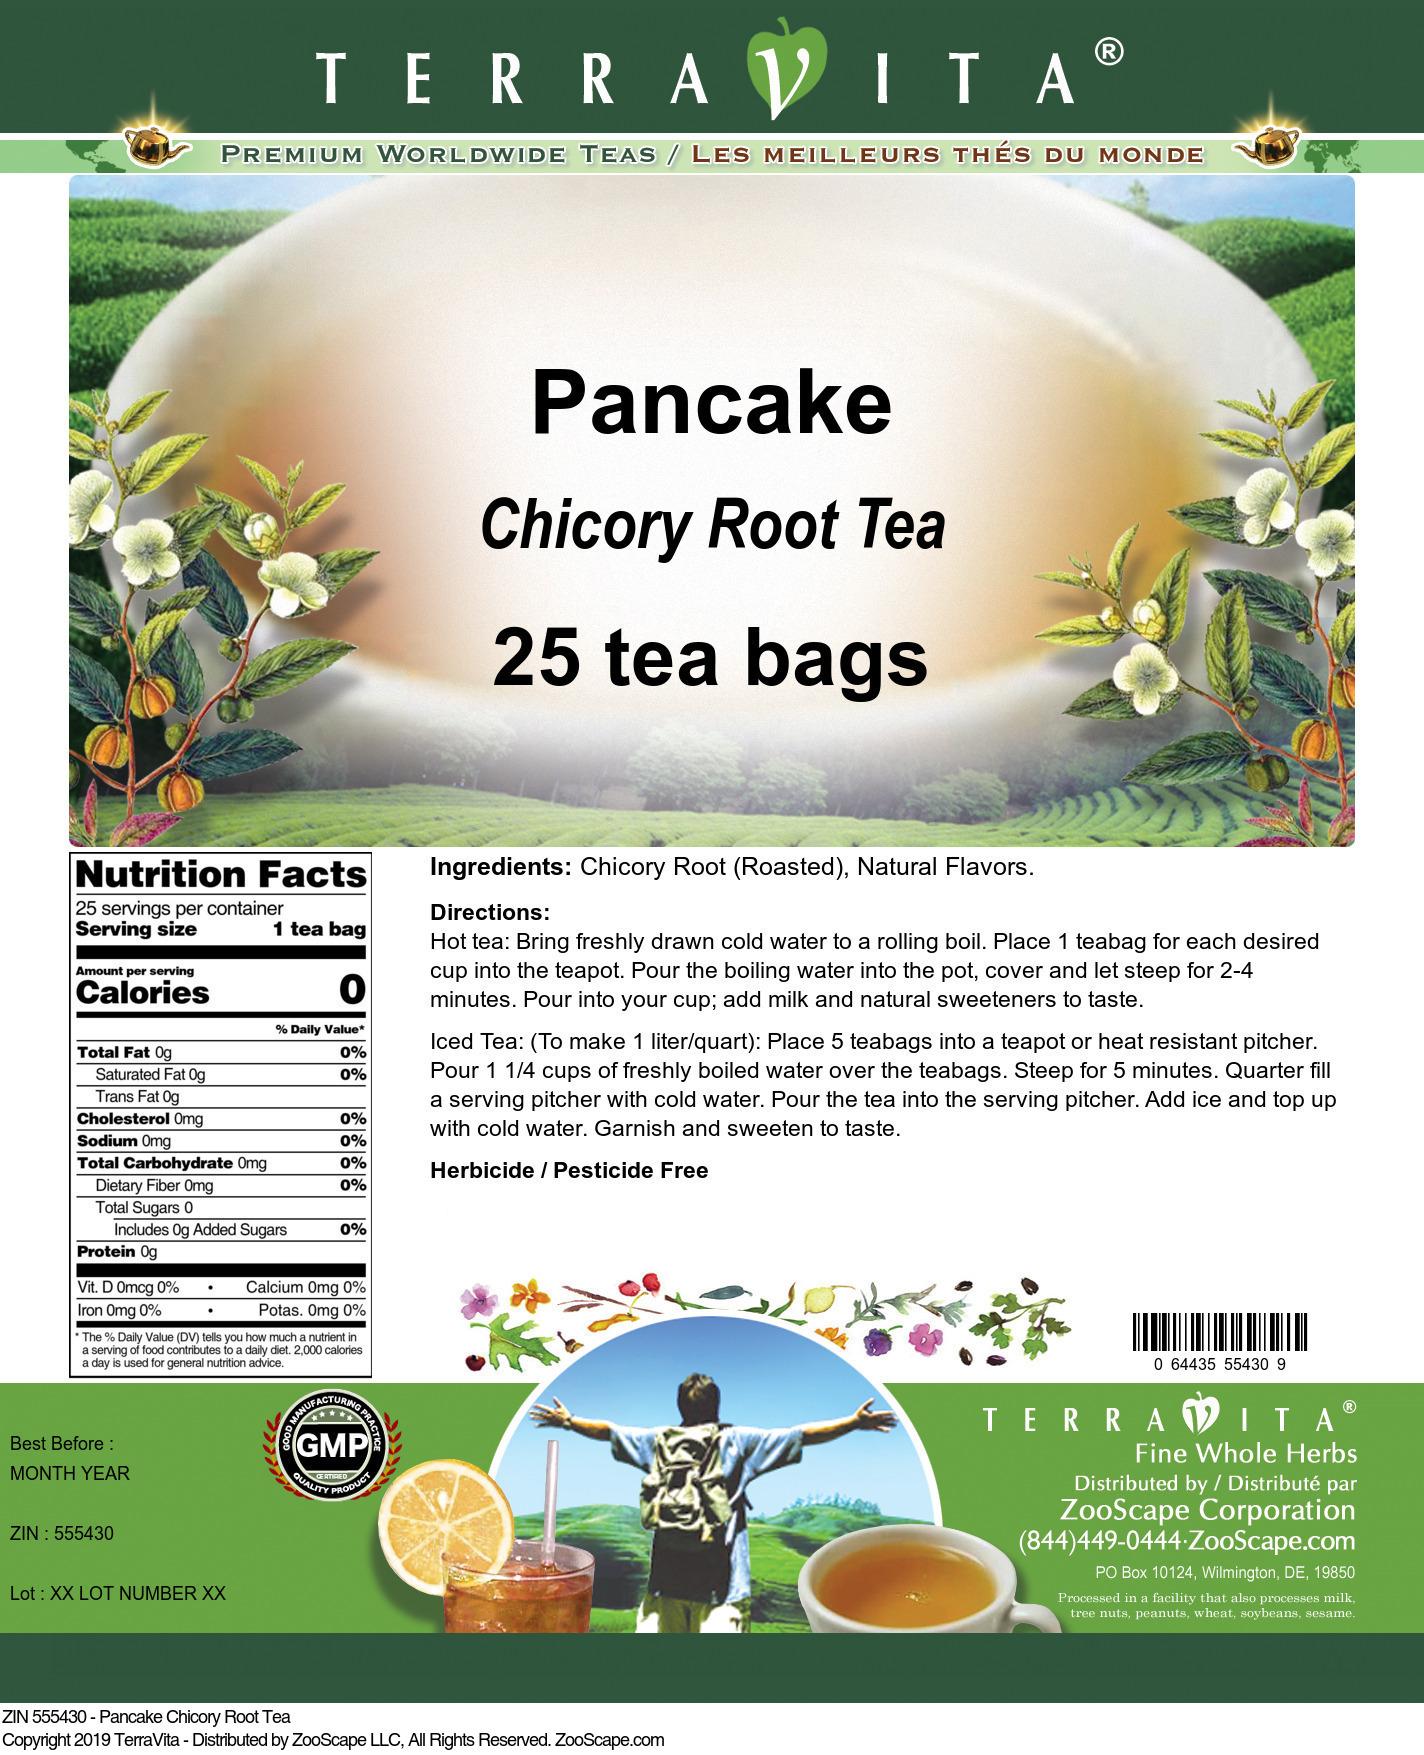 Pancake Chicory Root Tea